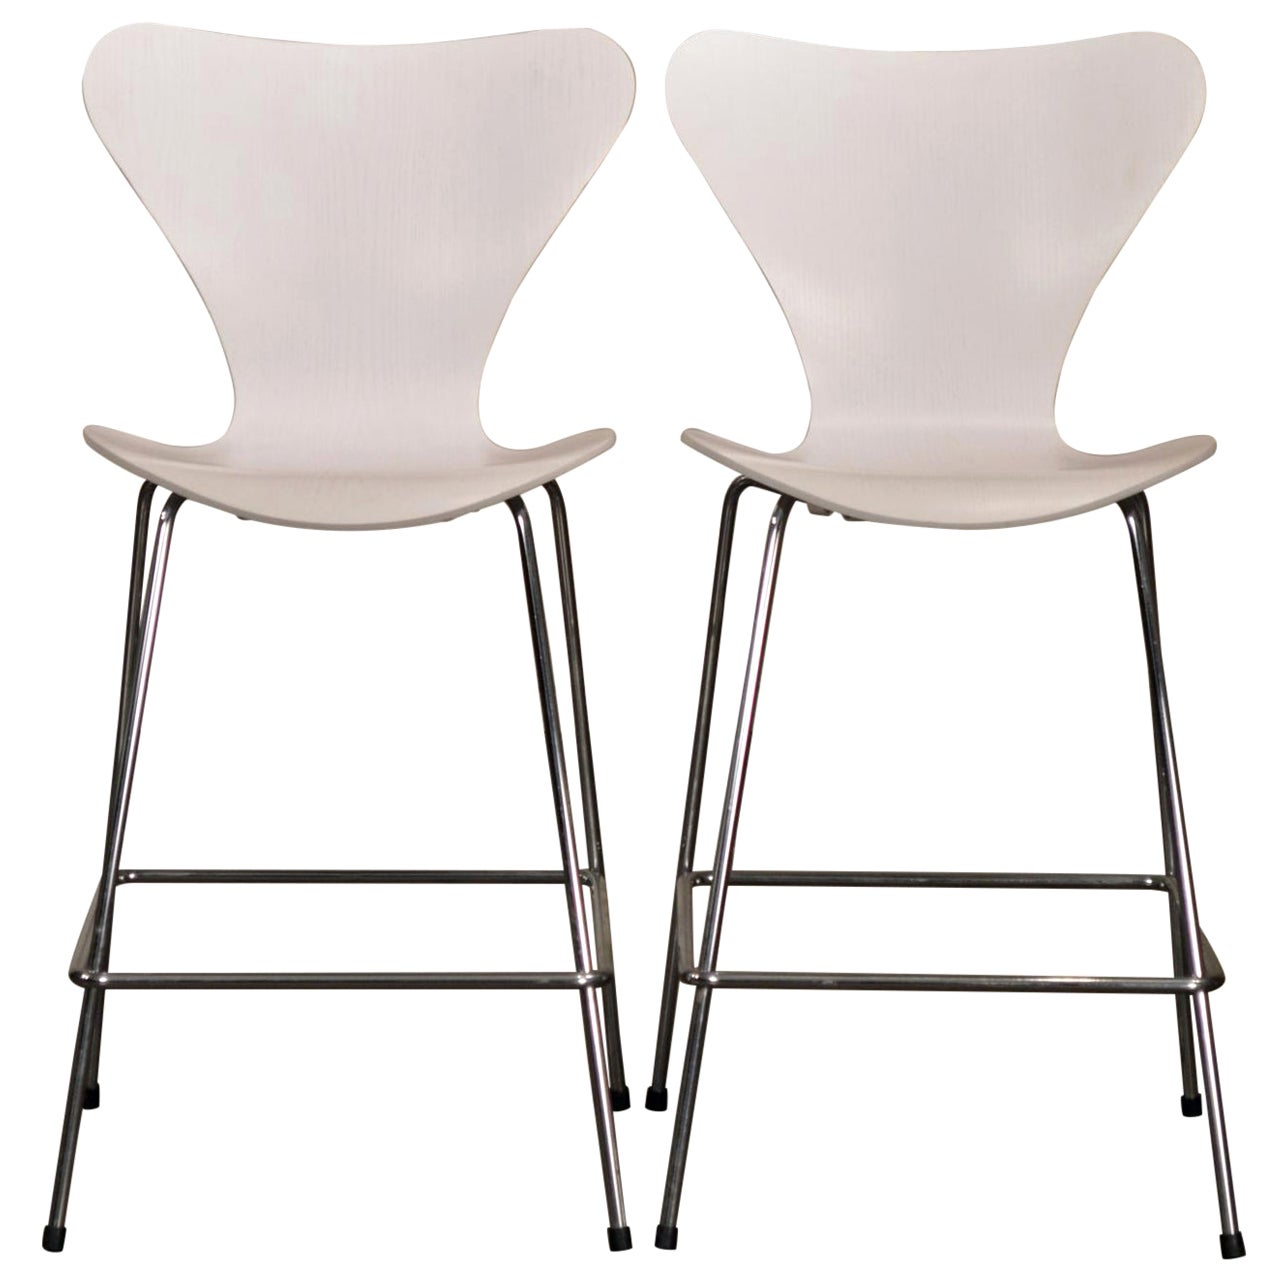 Arne Jacobsen Series 7 Bar Stools by Fritz Hansen